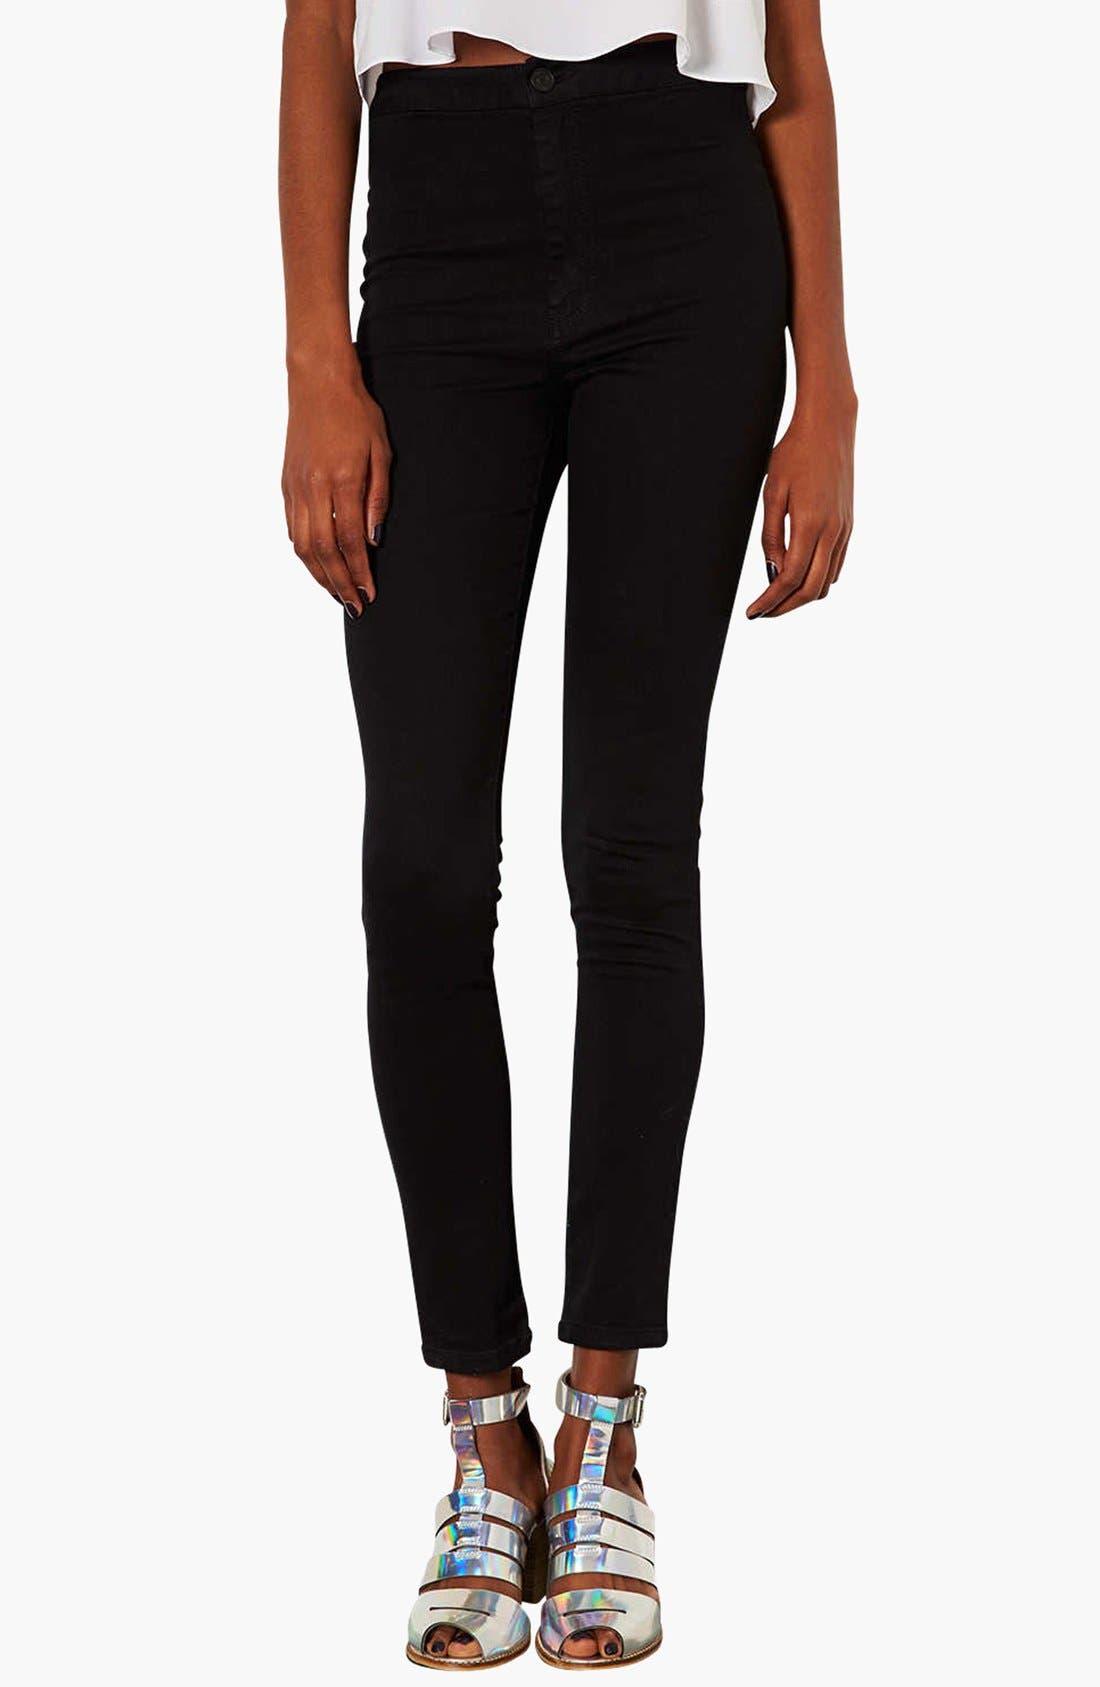 Alternate Image 1 Selected - Topshop Moto 'Joni' High Rise Skinny Jeans (Regular & Short)